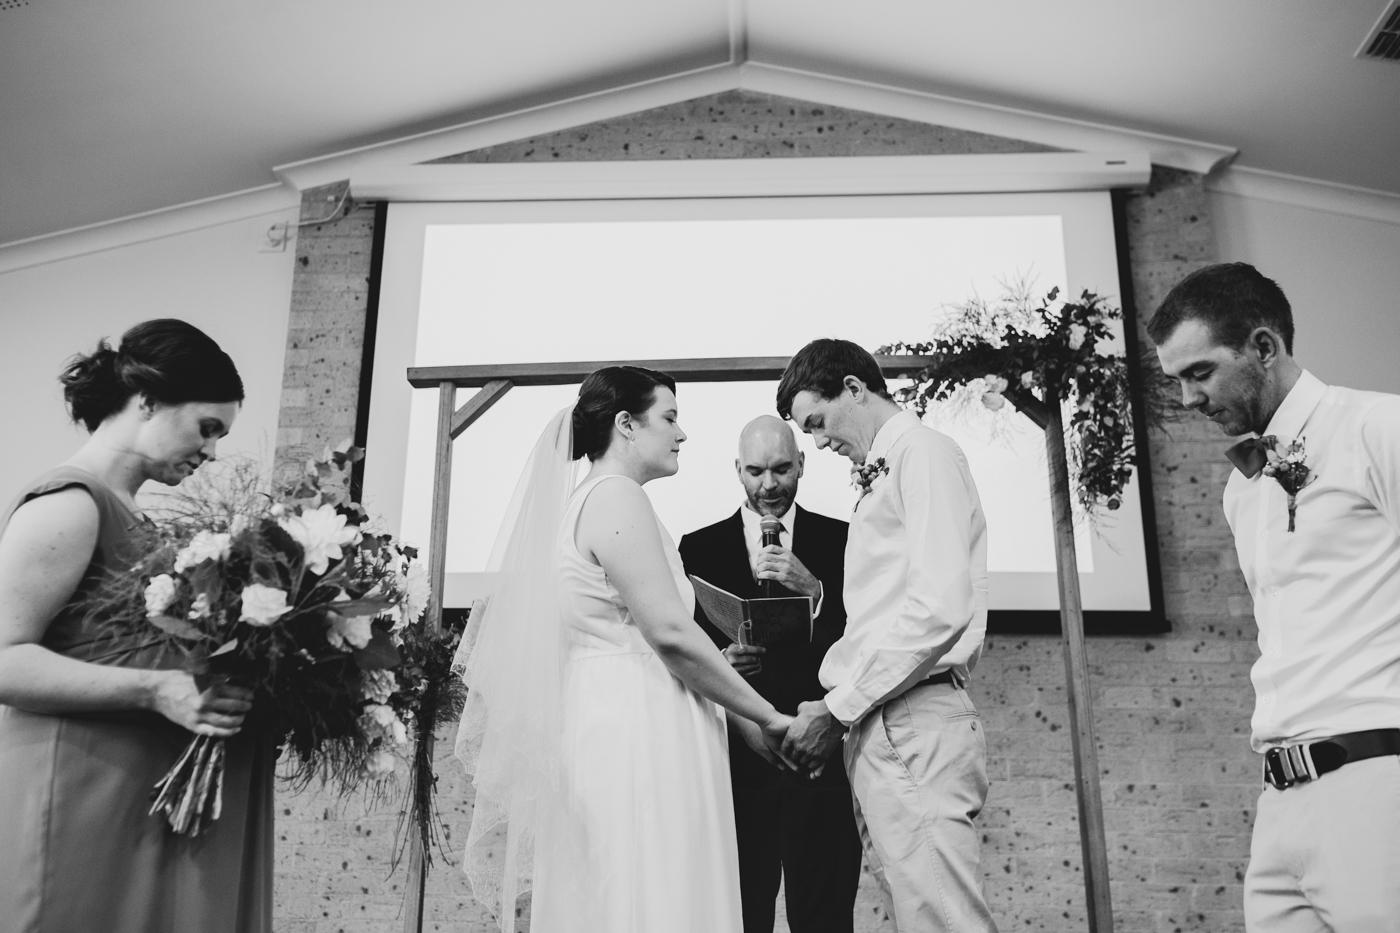 Nicolle & Jacob - Dubbo Wedding - Country Australia - Samantha Heather Photography-108.jpg